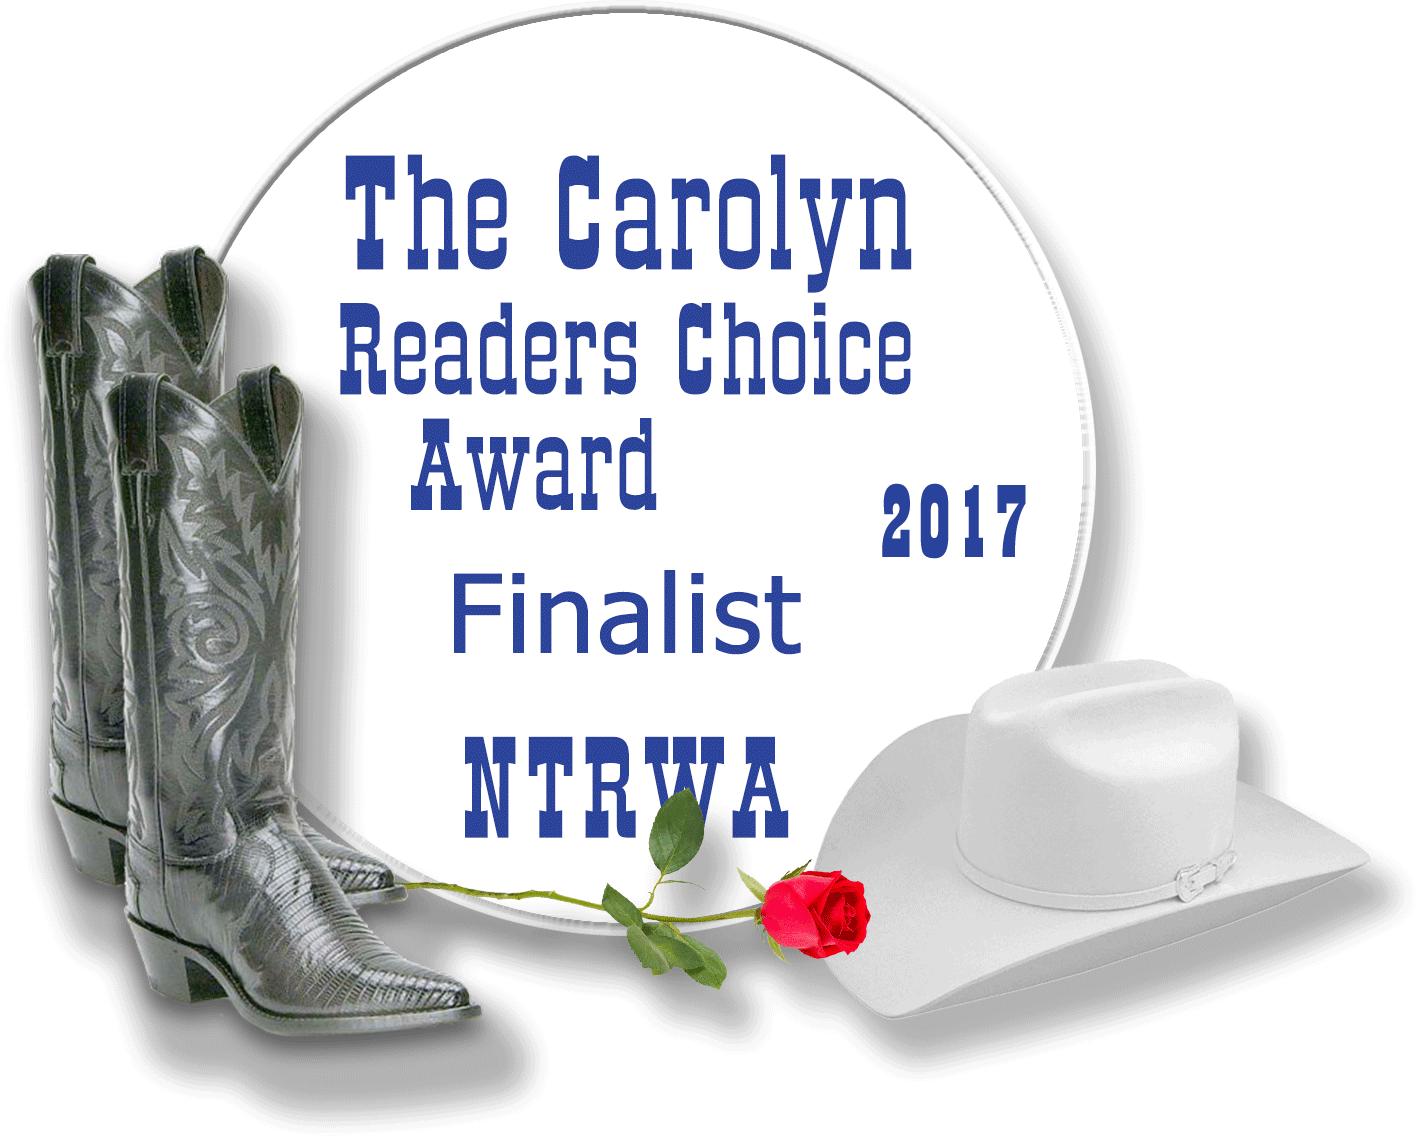 The Carolyn Readers Choice Award judges have chosen Maon: Marshal of Tallav as 1 of 5 finalists. #SonsofTallav @CailinBriste